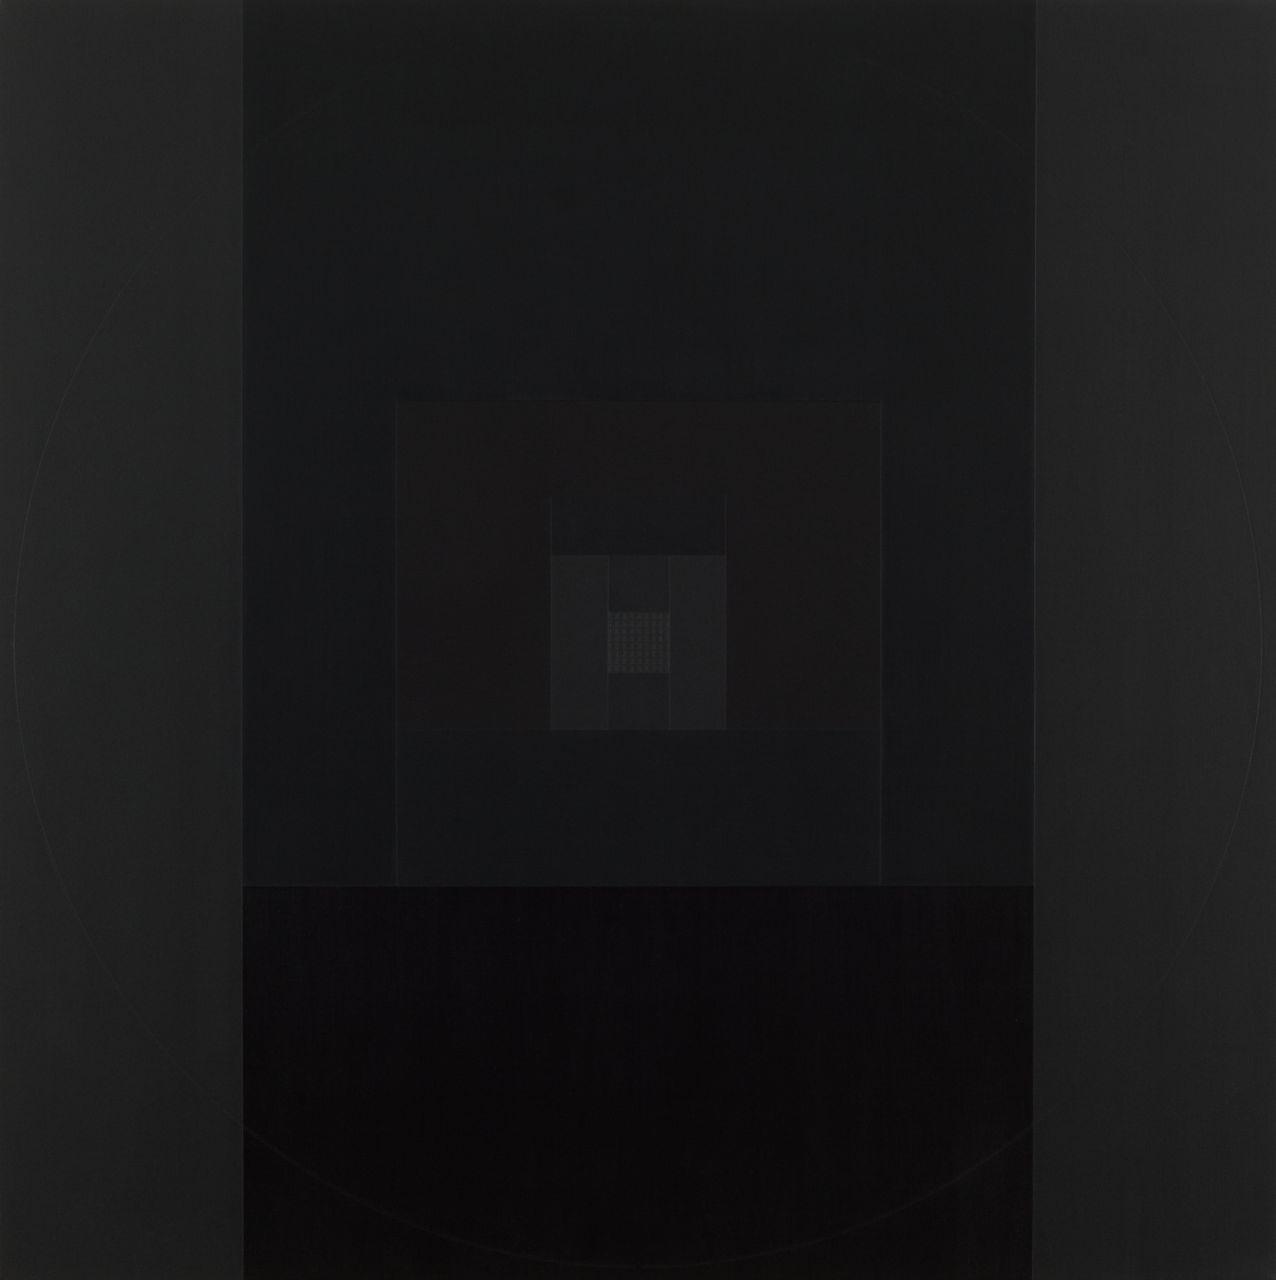 Yantra-ipsum-arkhē 2011.Jan, acrylic on canvas, 35 7/16 x 35 7/16 in. [90x90cm]